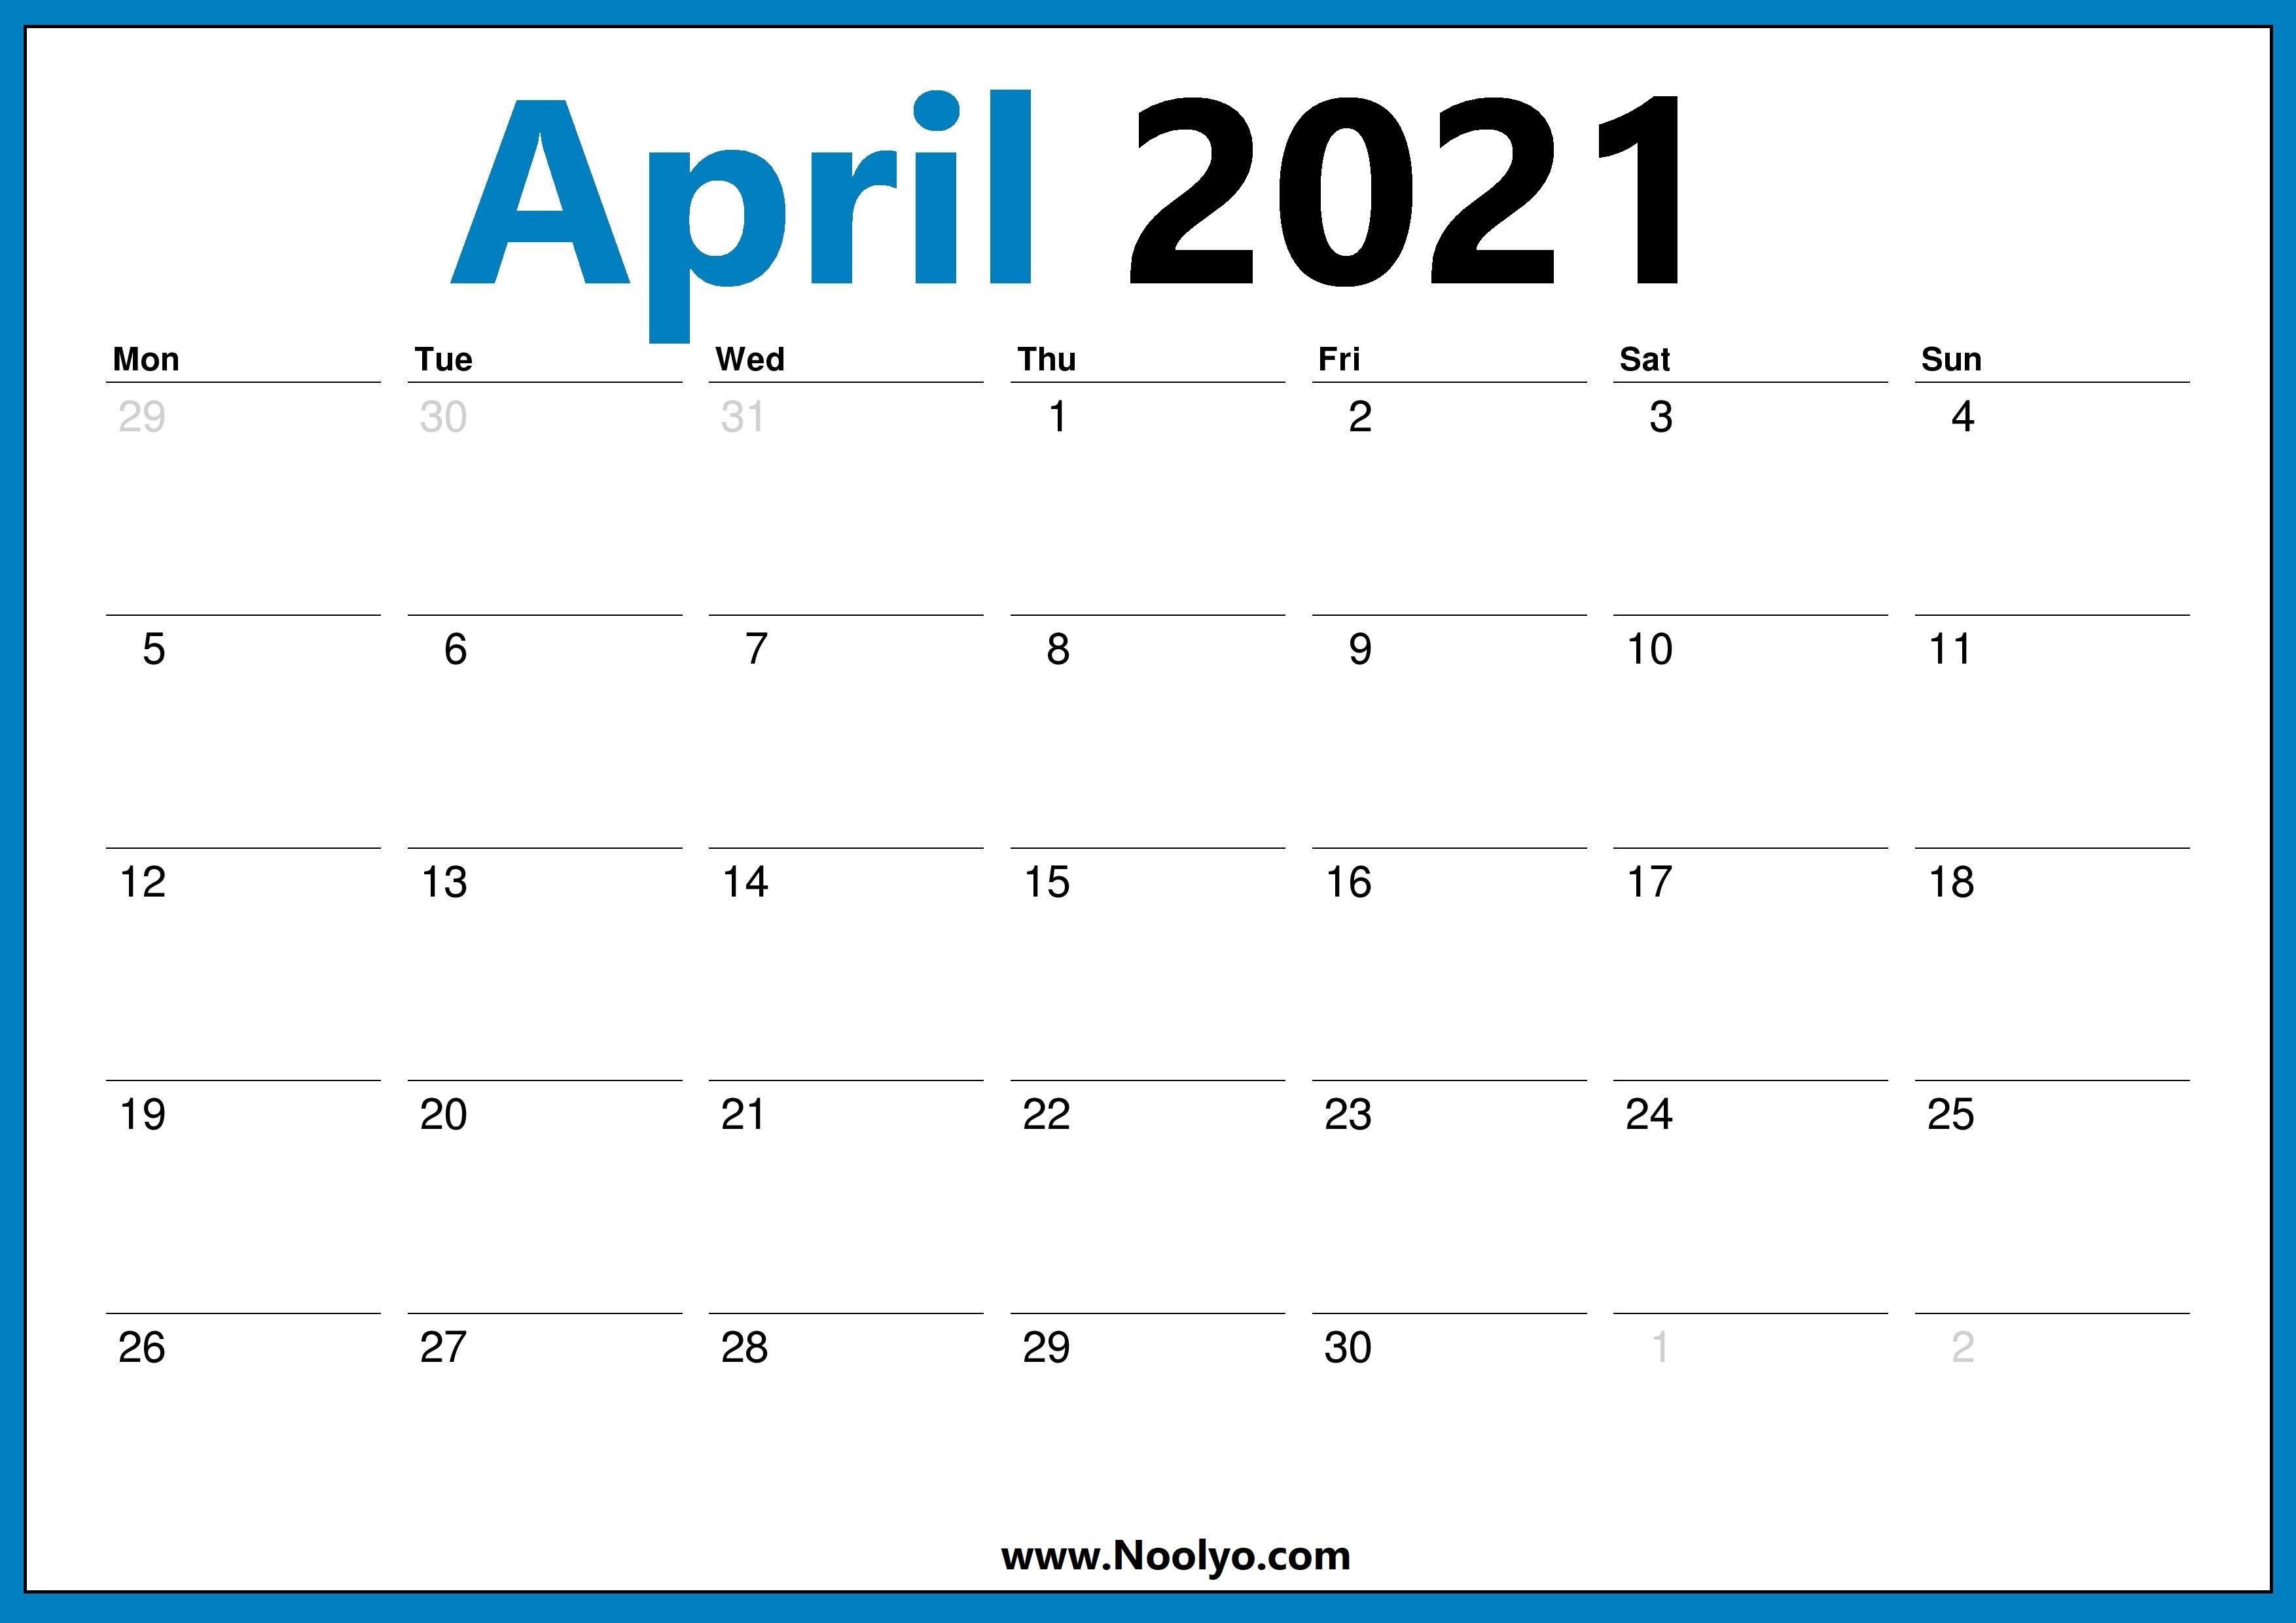 April 2021 Calendar Starts with Monday - Noolyo.com